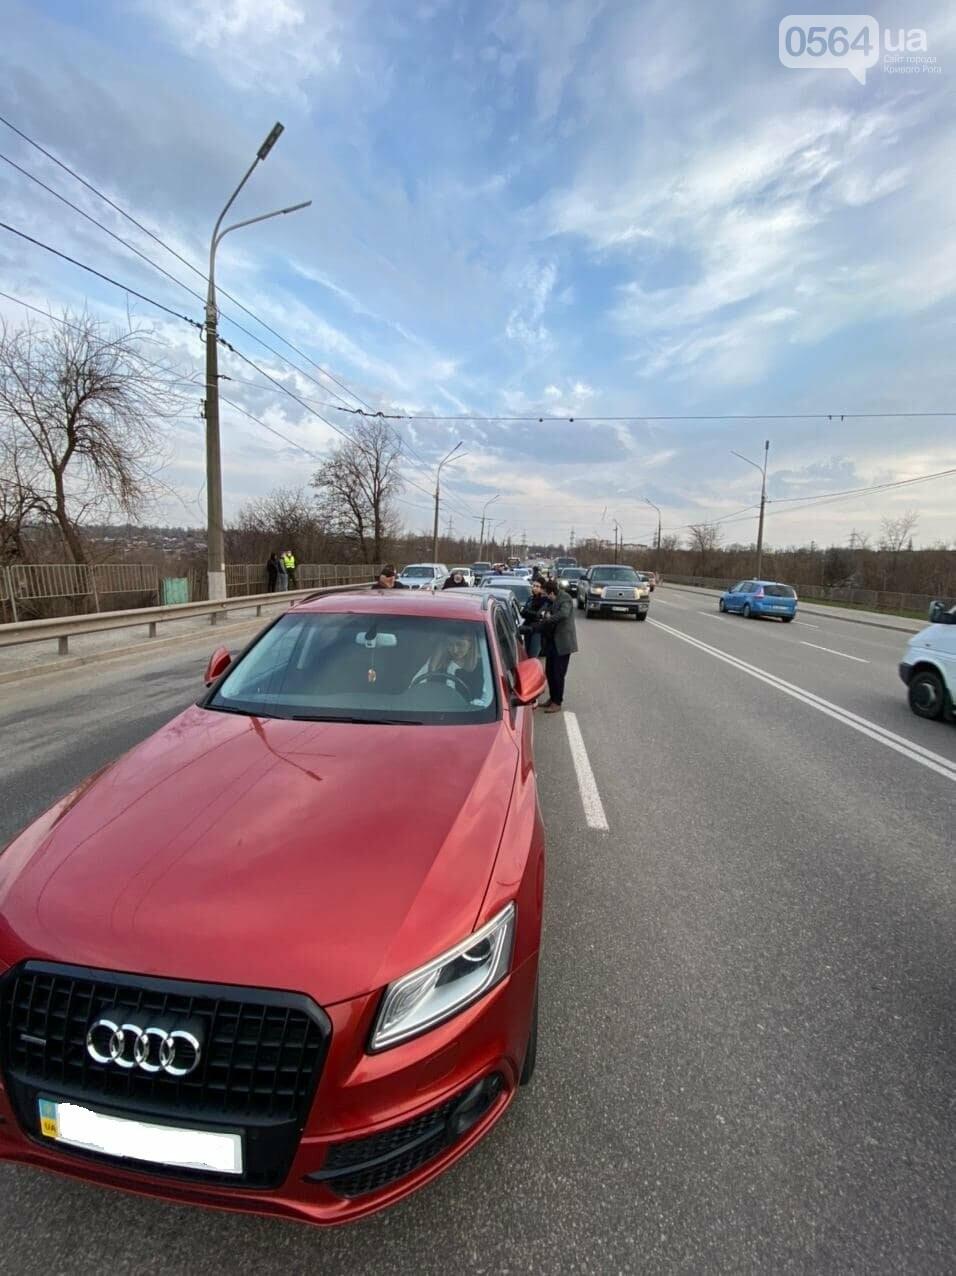 5 машин разбились в ДТП в Кривом Роге, - ФОТО, фото-1